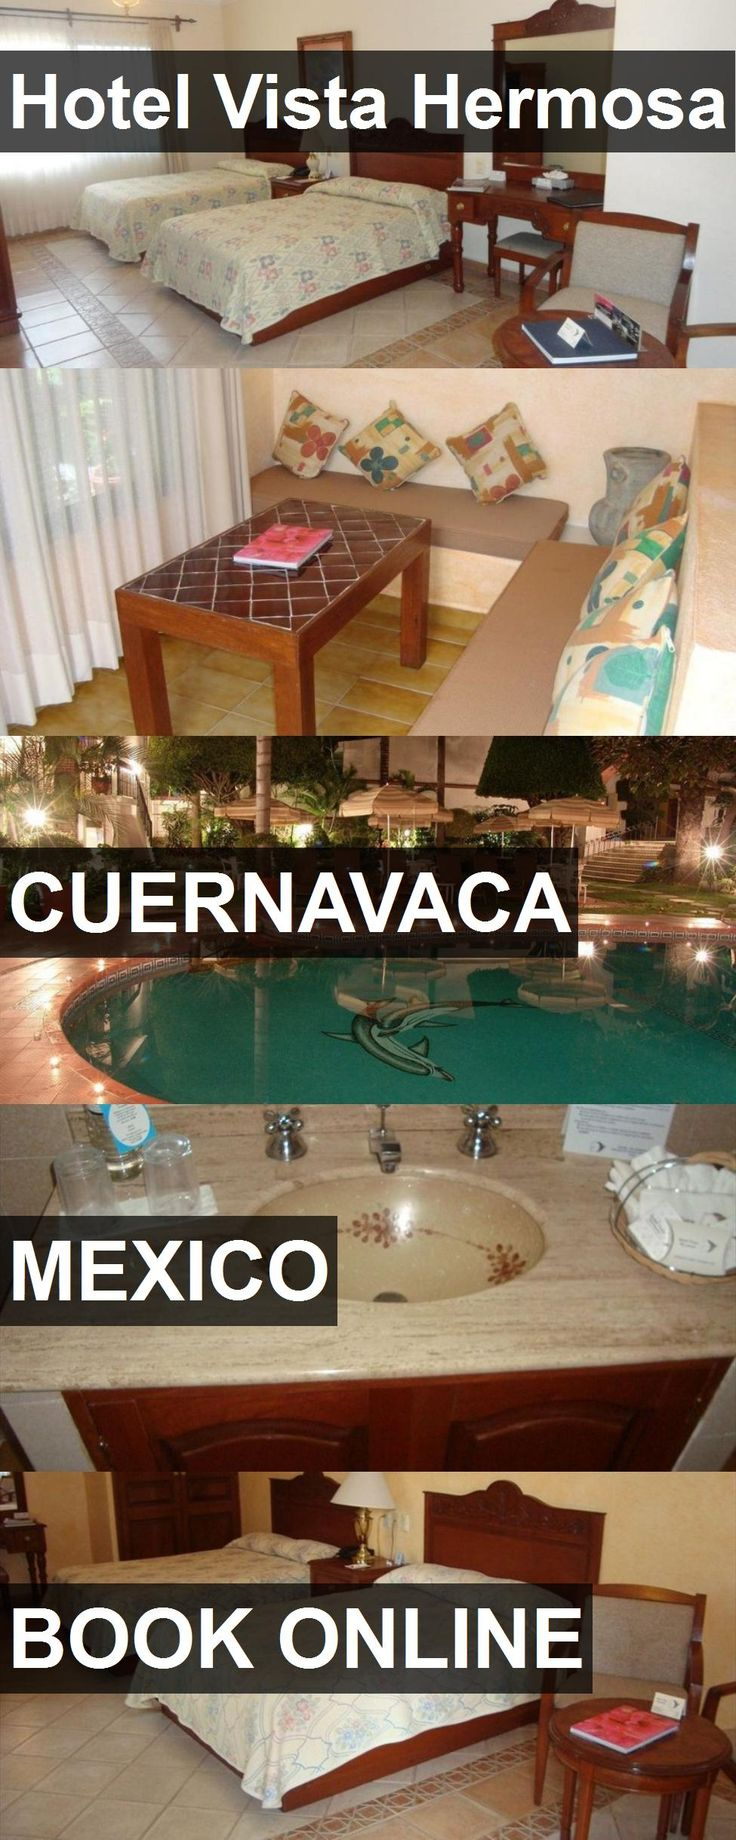 Hotel Vista Hermosa in Cuernavaca, Mexico. For more information, photos, reviews and best prices please follow the link. #Mexico #Cuernavaca #travel #vacation #hotel